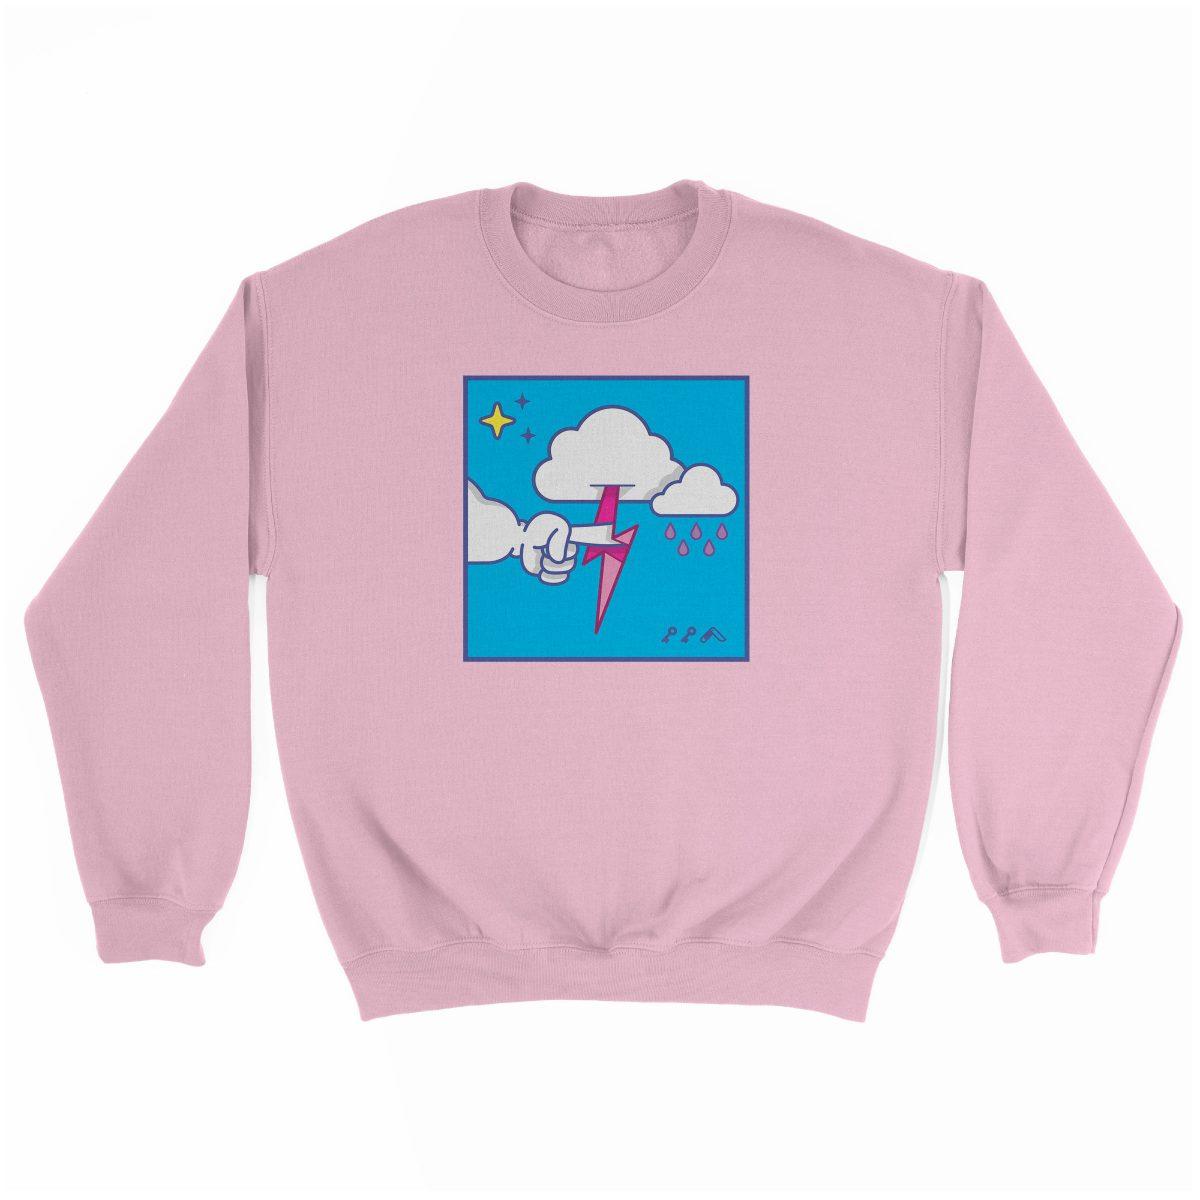 """MUTUAL CLOUDSENT"" funny adult cartoon animation style sweatshirt in light pink at kikicutt.com"